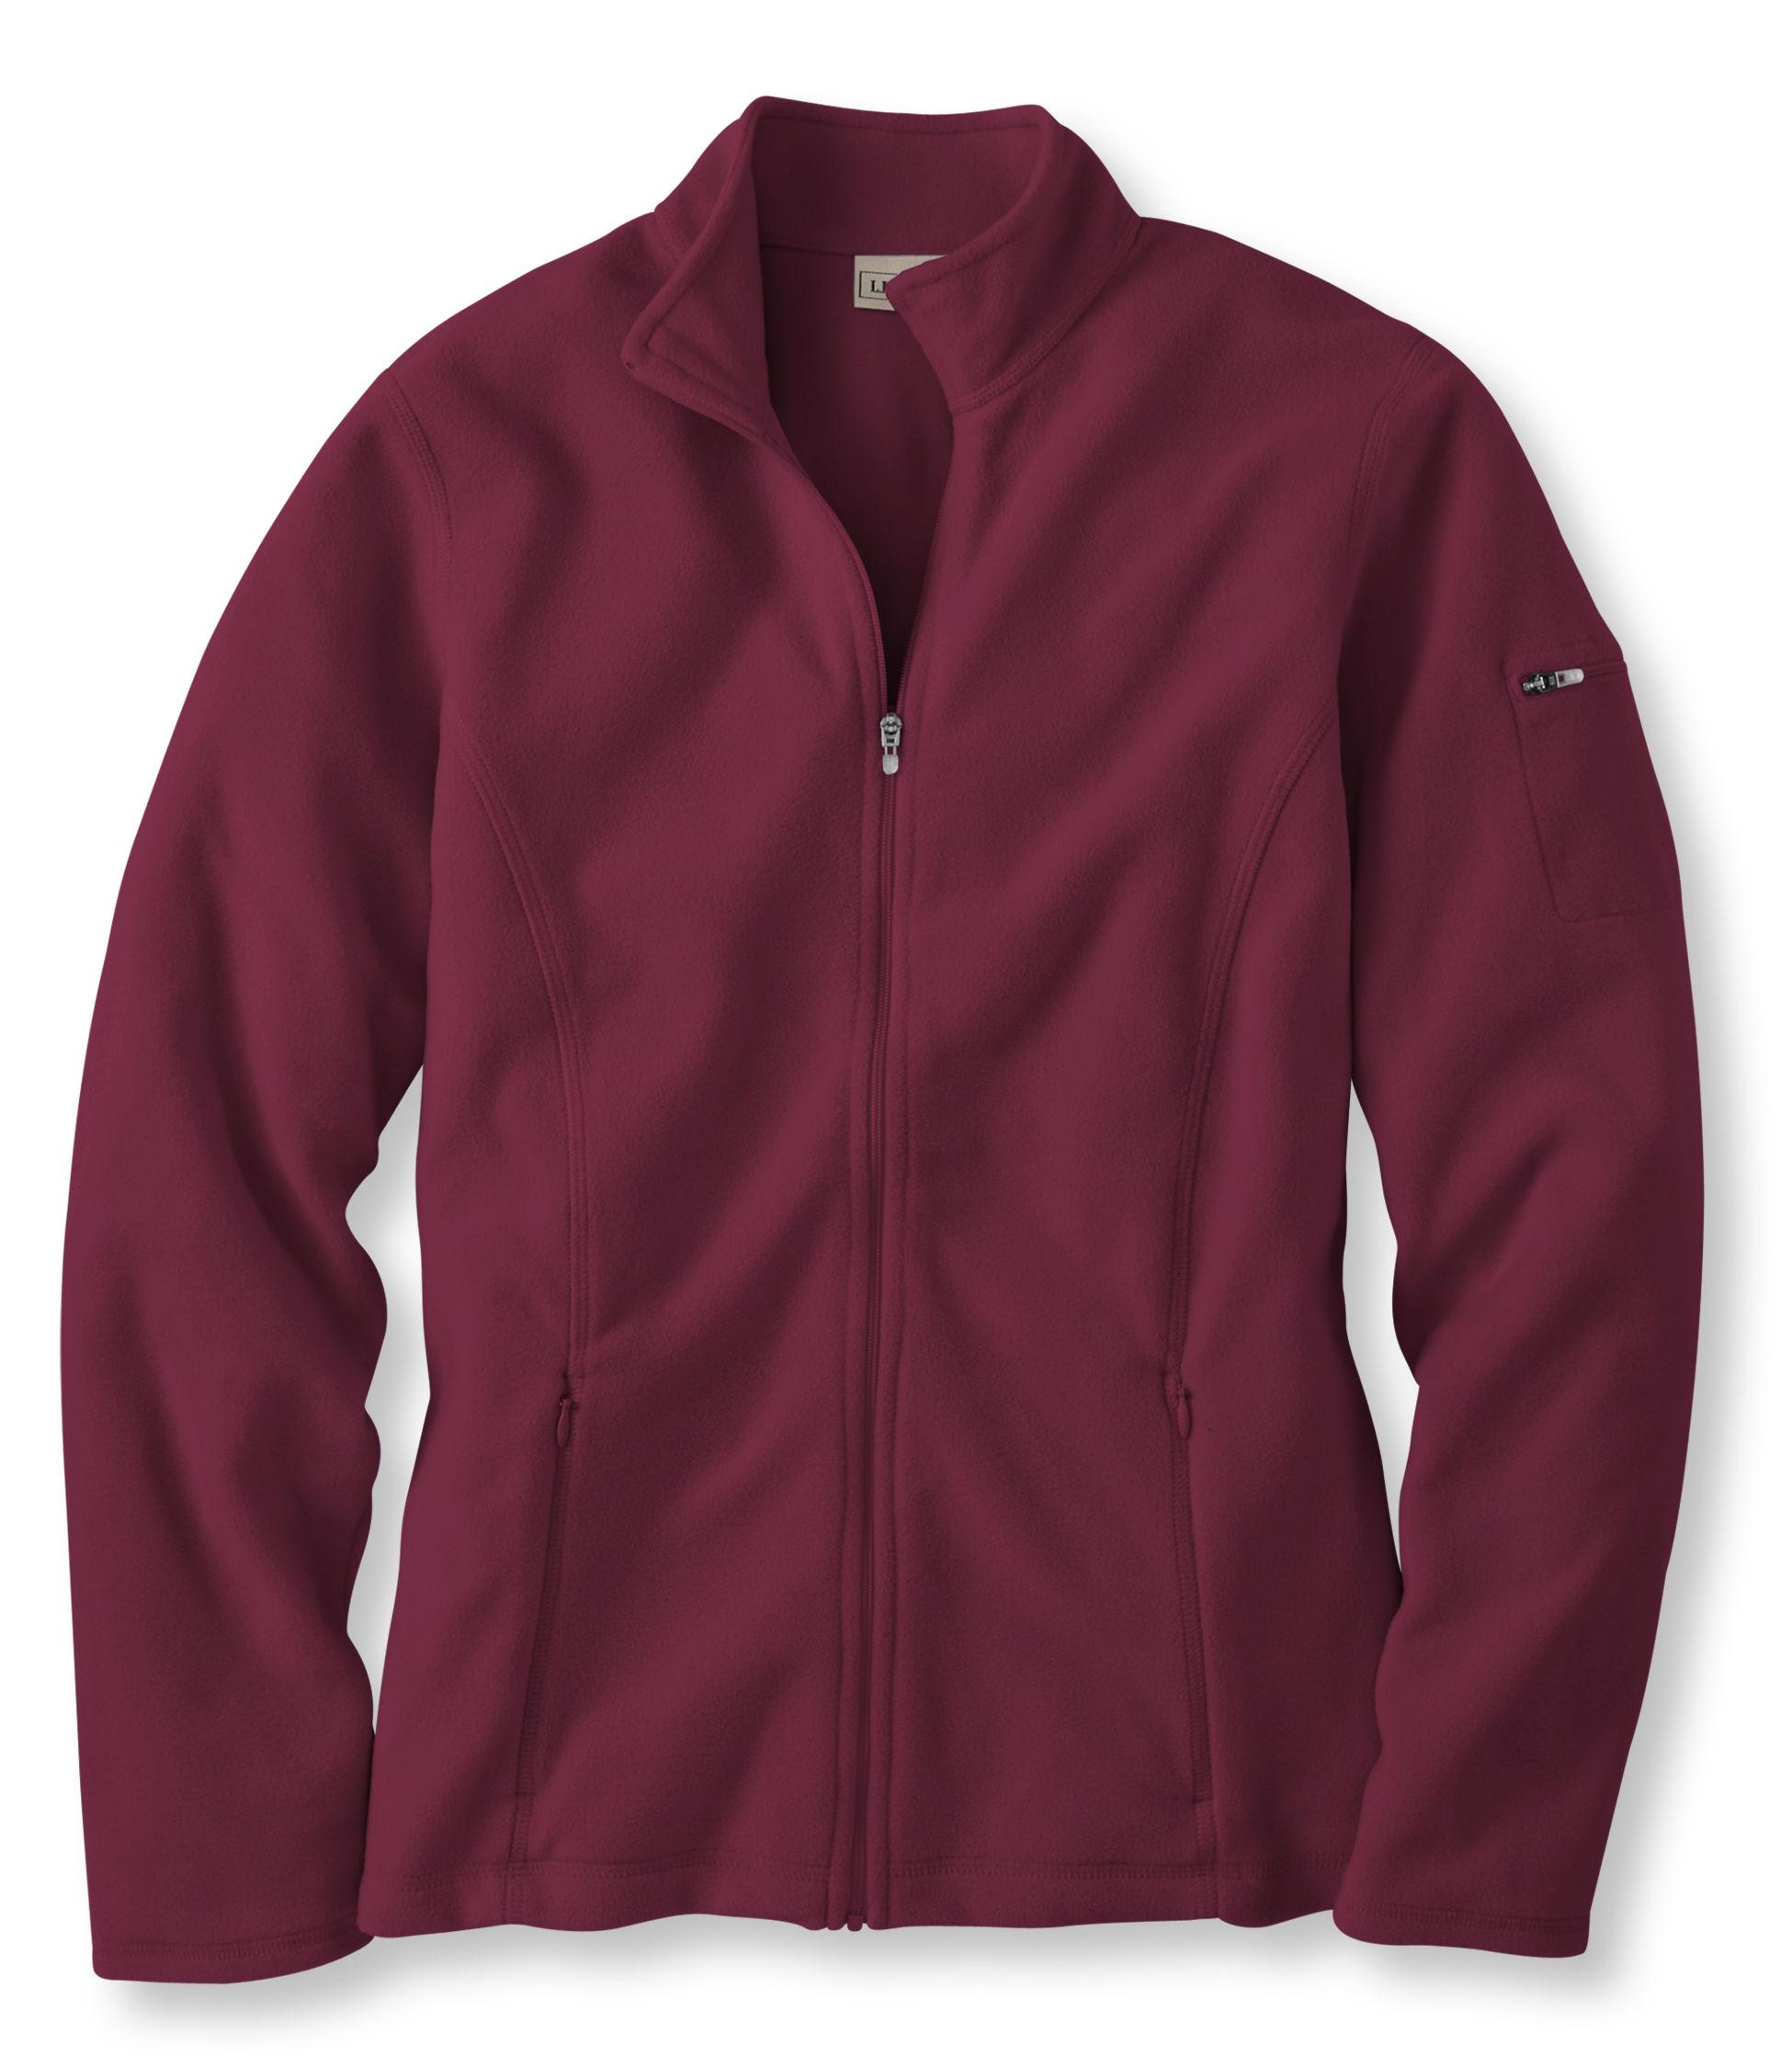 L.L.Bean Fitness Fleece, Jacket